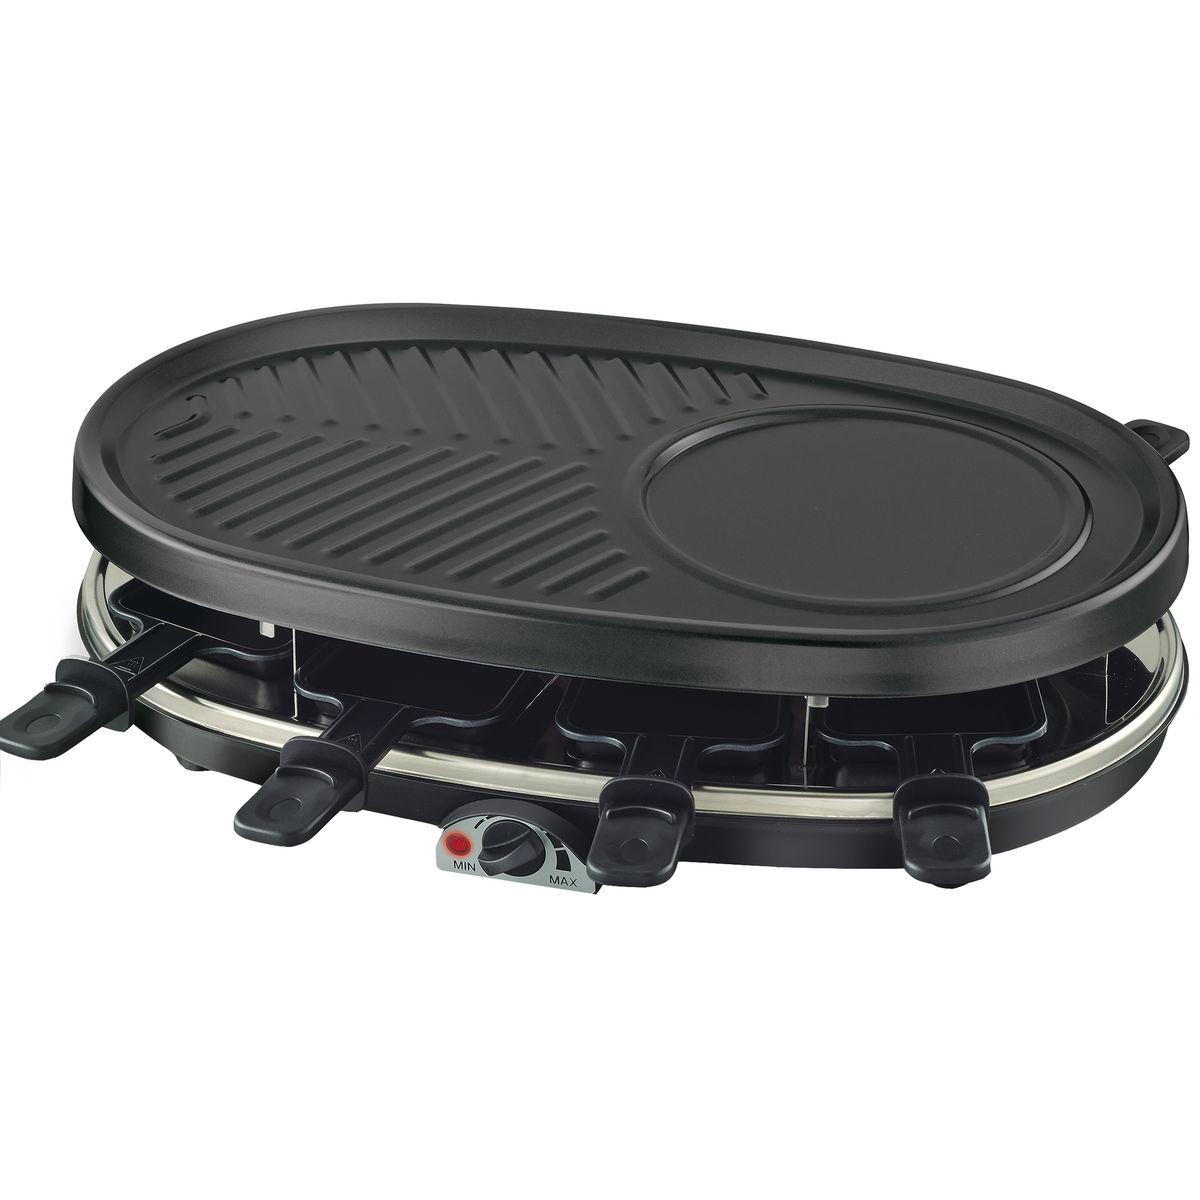 Mandine Raclette/Grill MRGP158-16